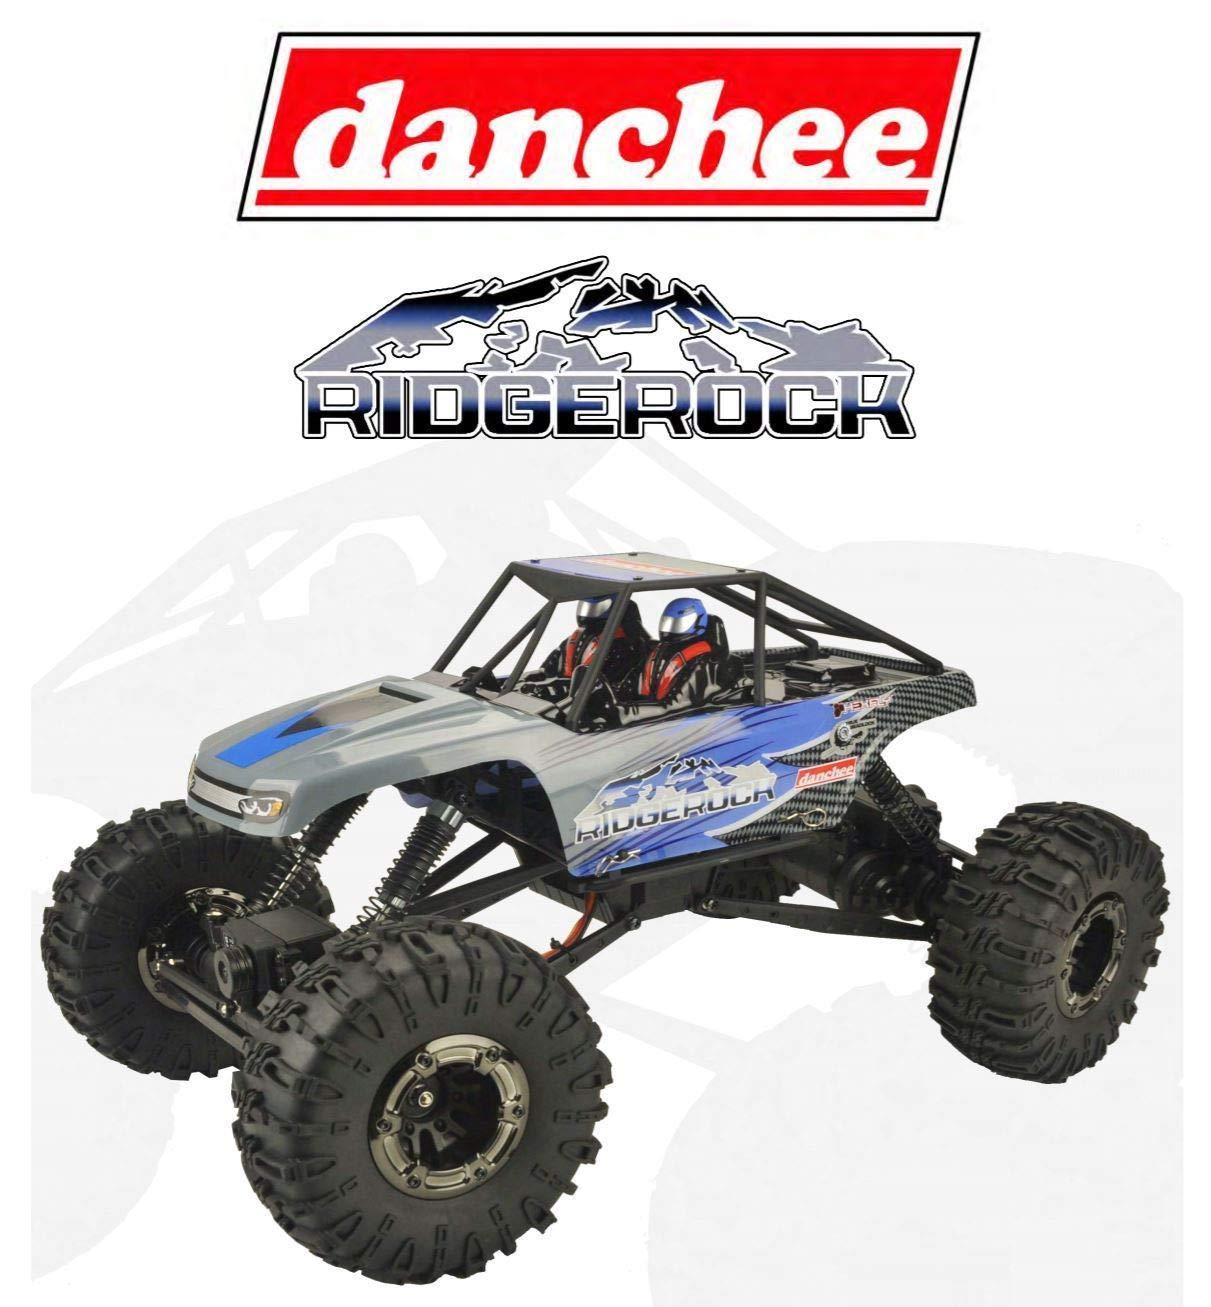 danchee Ridgerock 1/10 Scale Electric Crawler by Redcat Racing